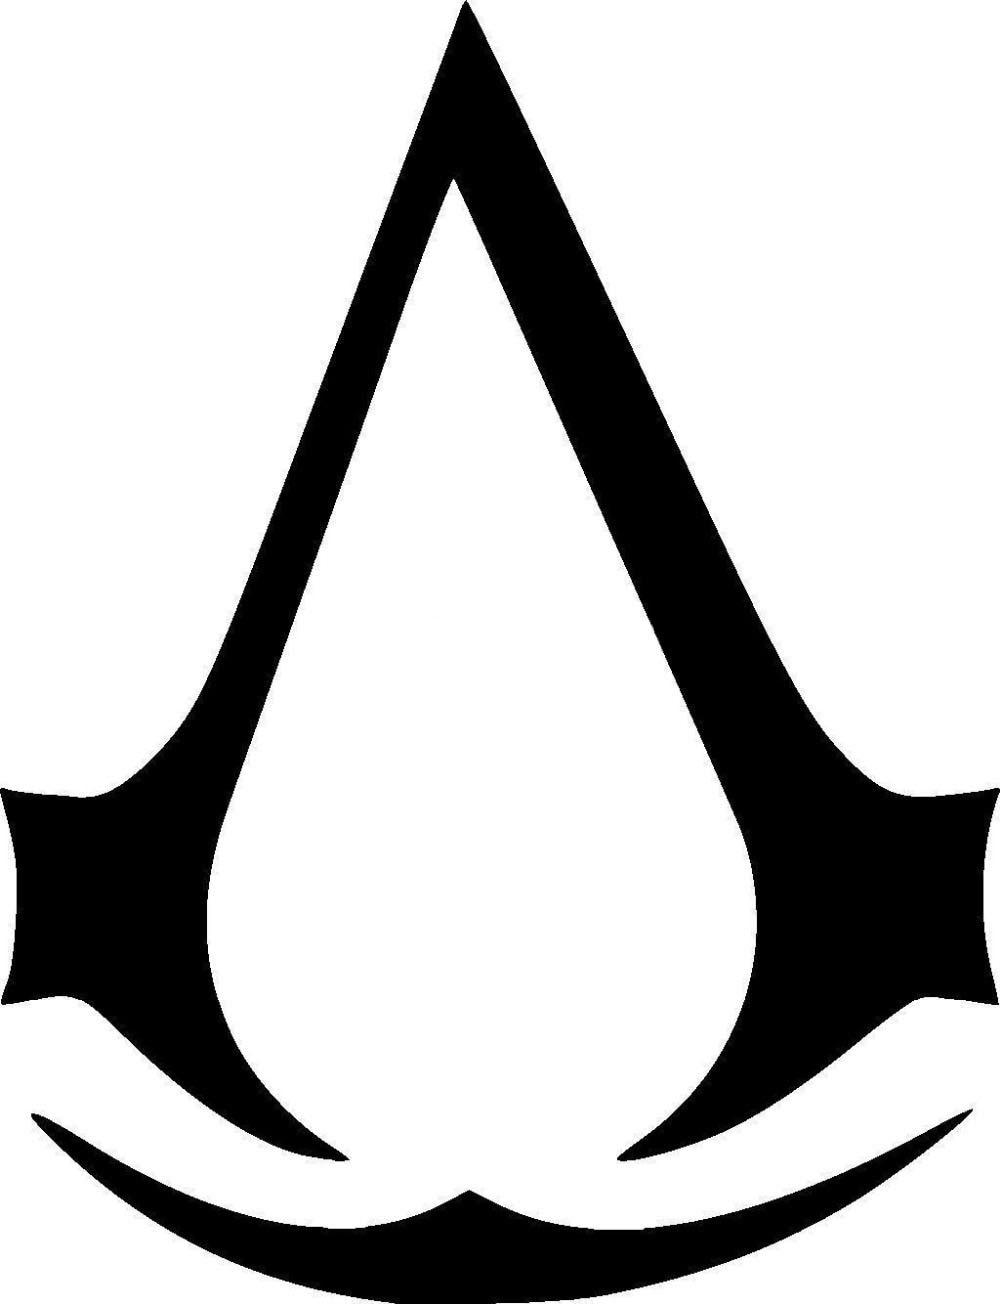 assassins creed logo sticker vinyl decal for car window truck laptop boat auto bumper funny jdm. Black Bedroom Furniture Sets. Home Design Ideas